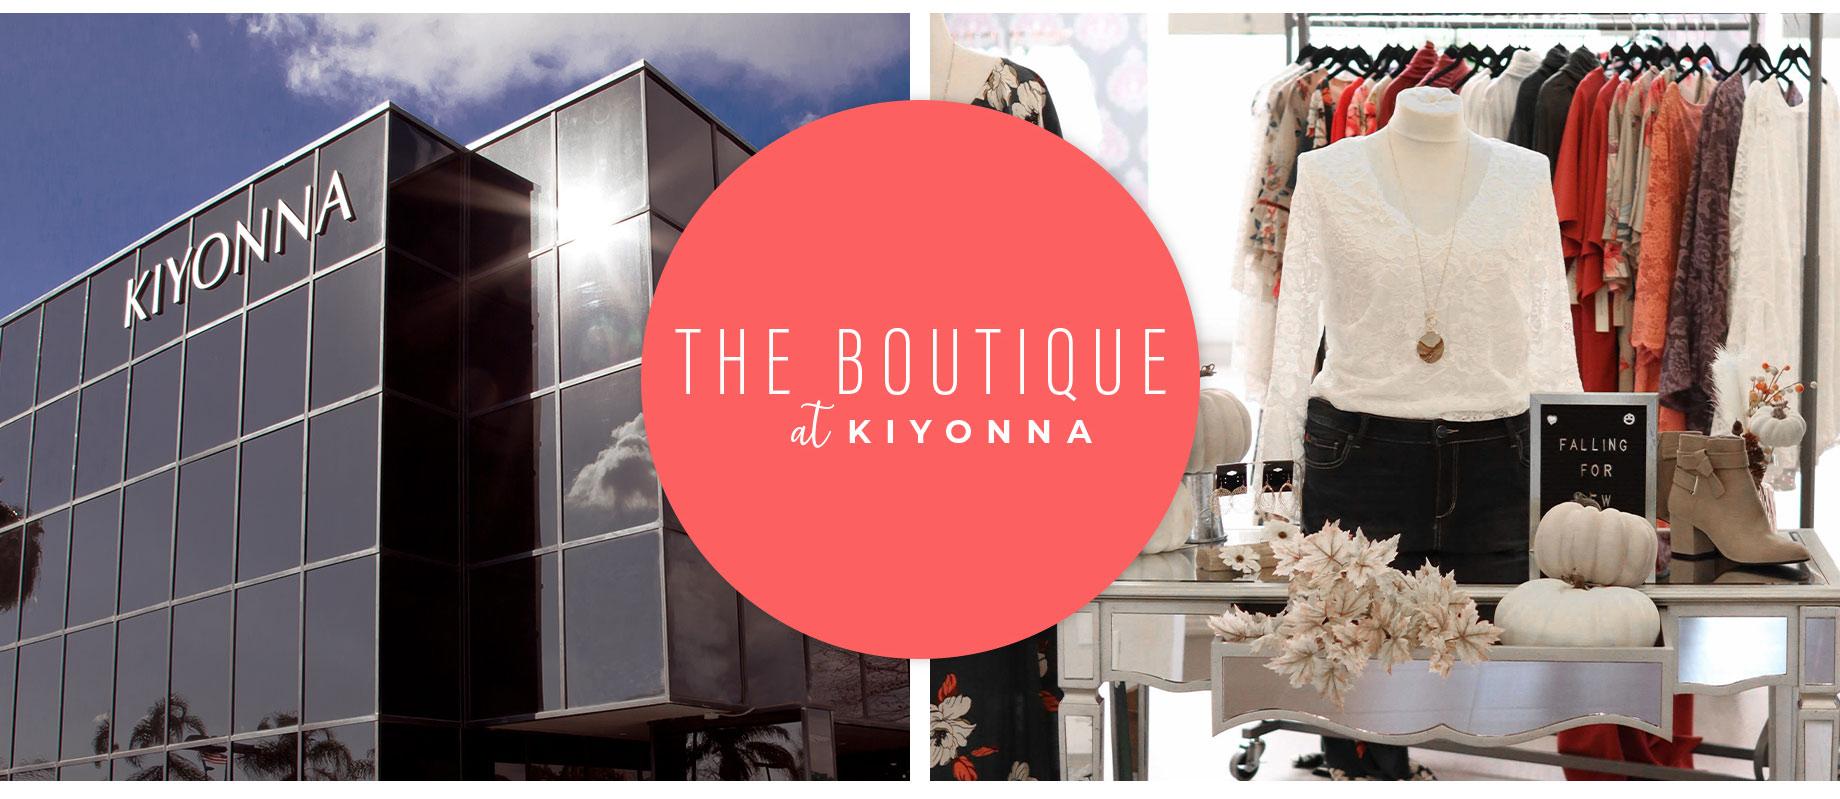 The boutique at Kiyonna